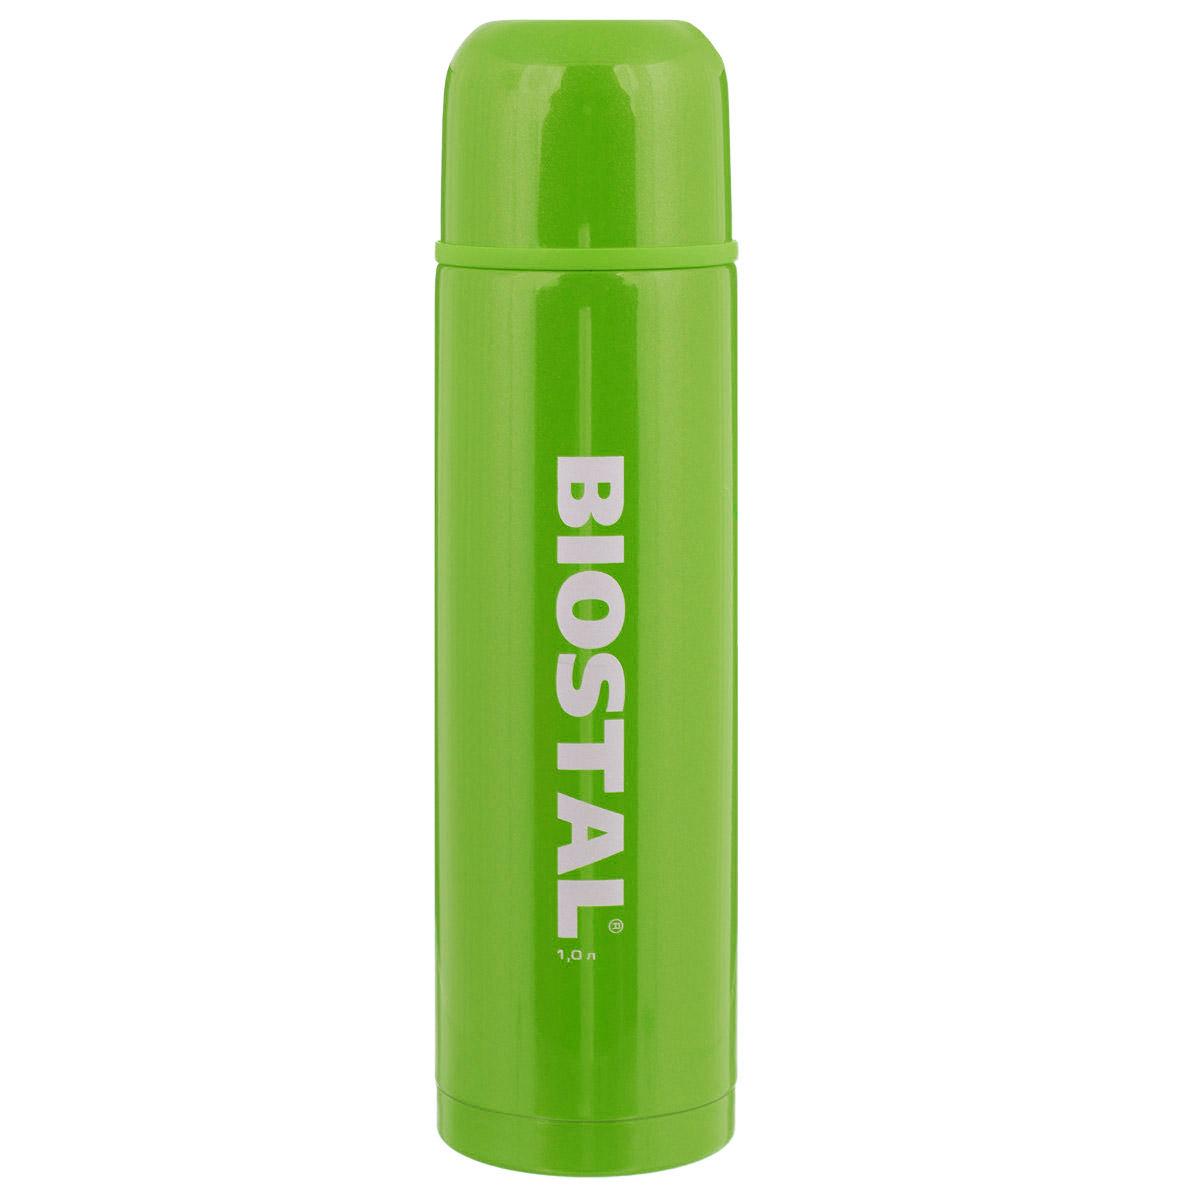 "Термос BIOSTAL ""Fler"", цвет: зеленый, 1 л. NB-1000С-G"